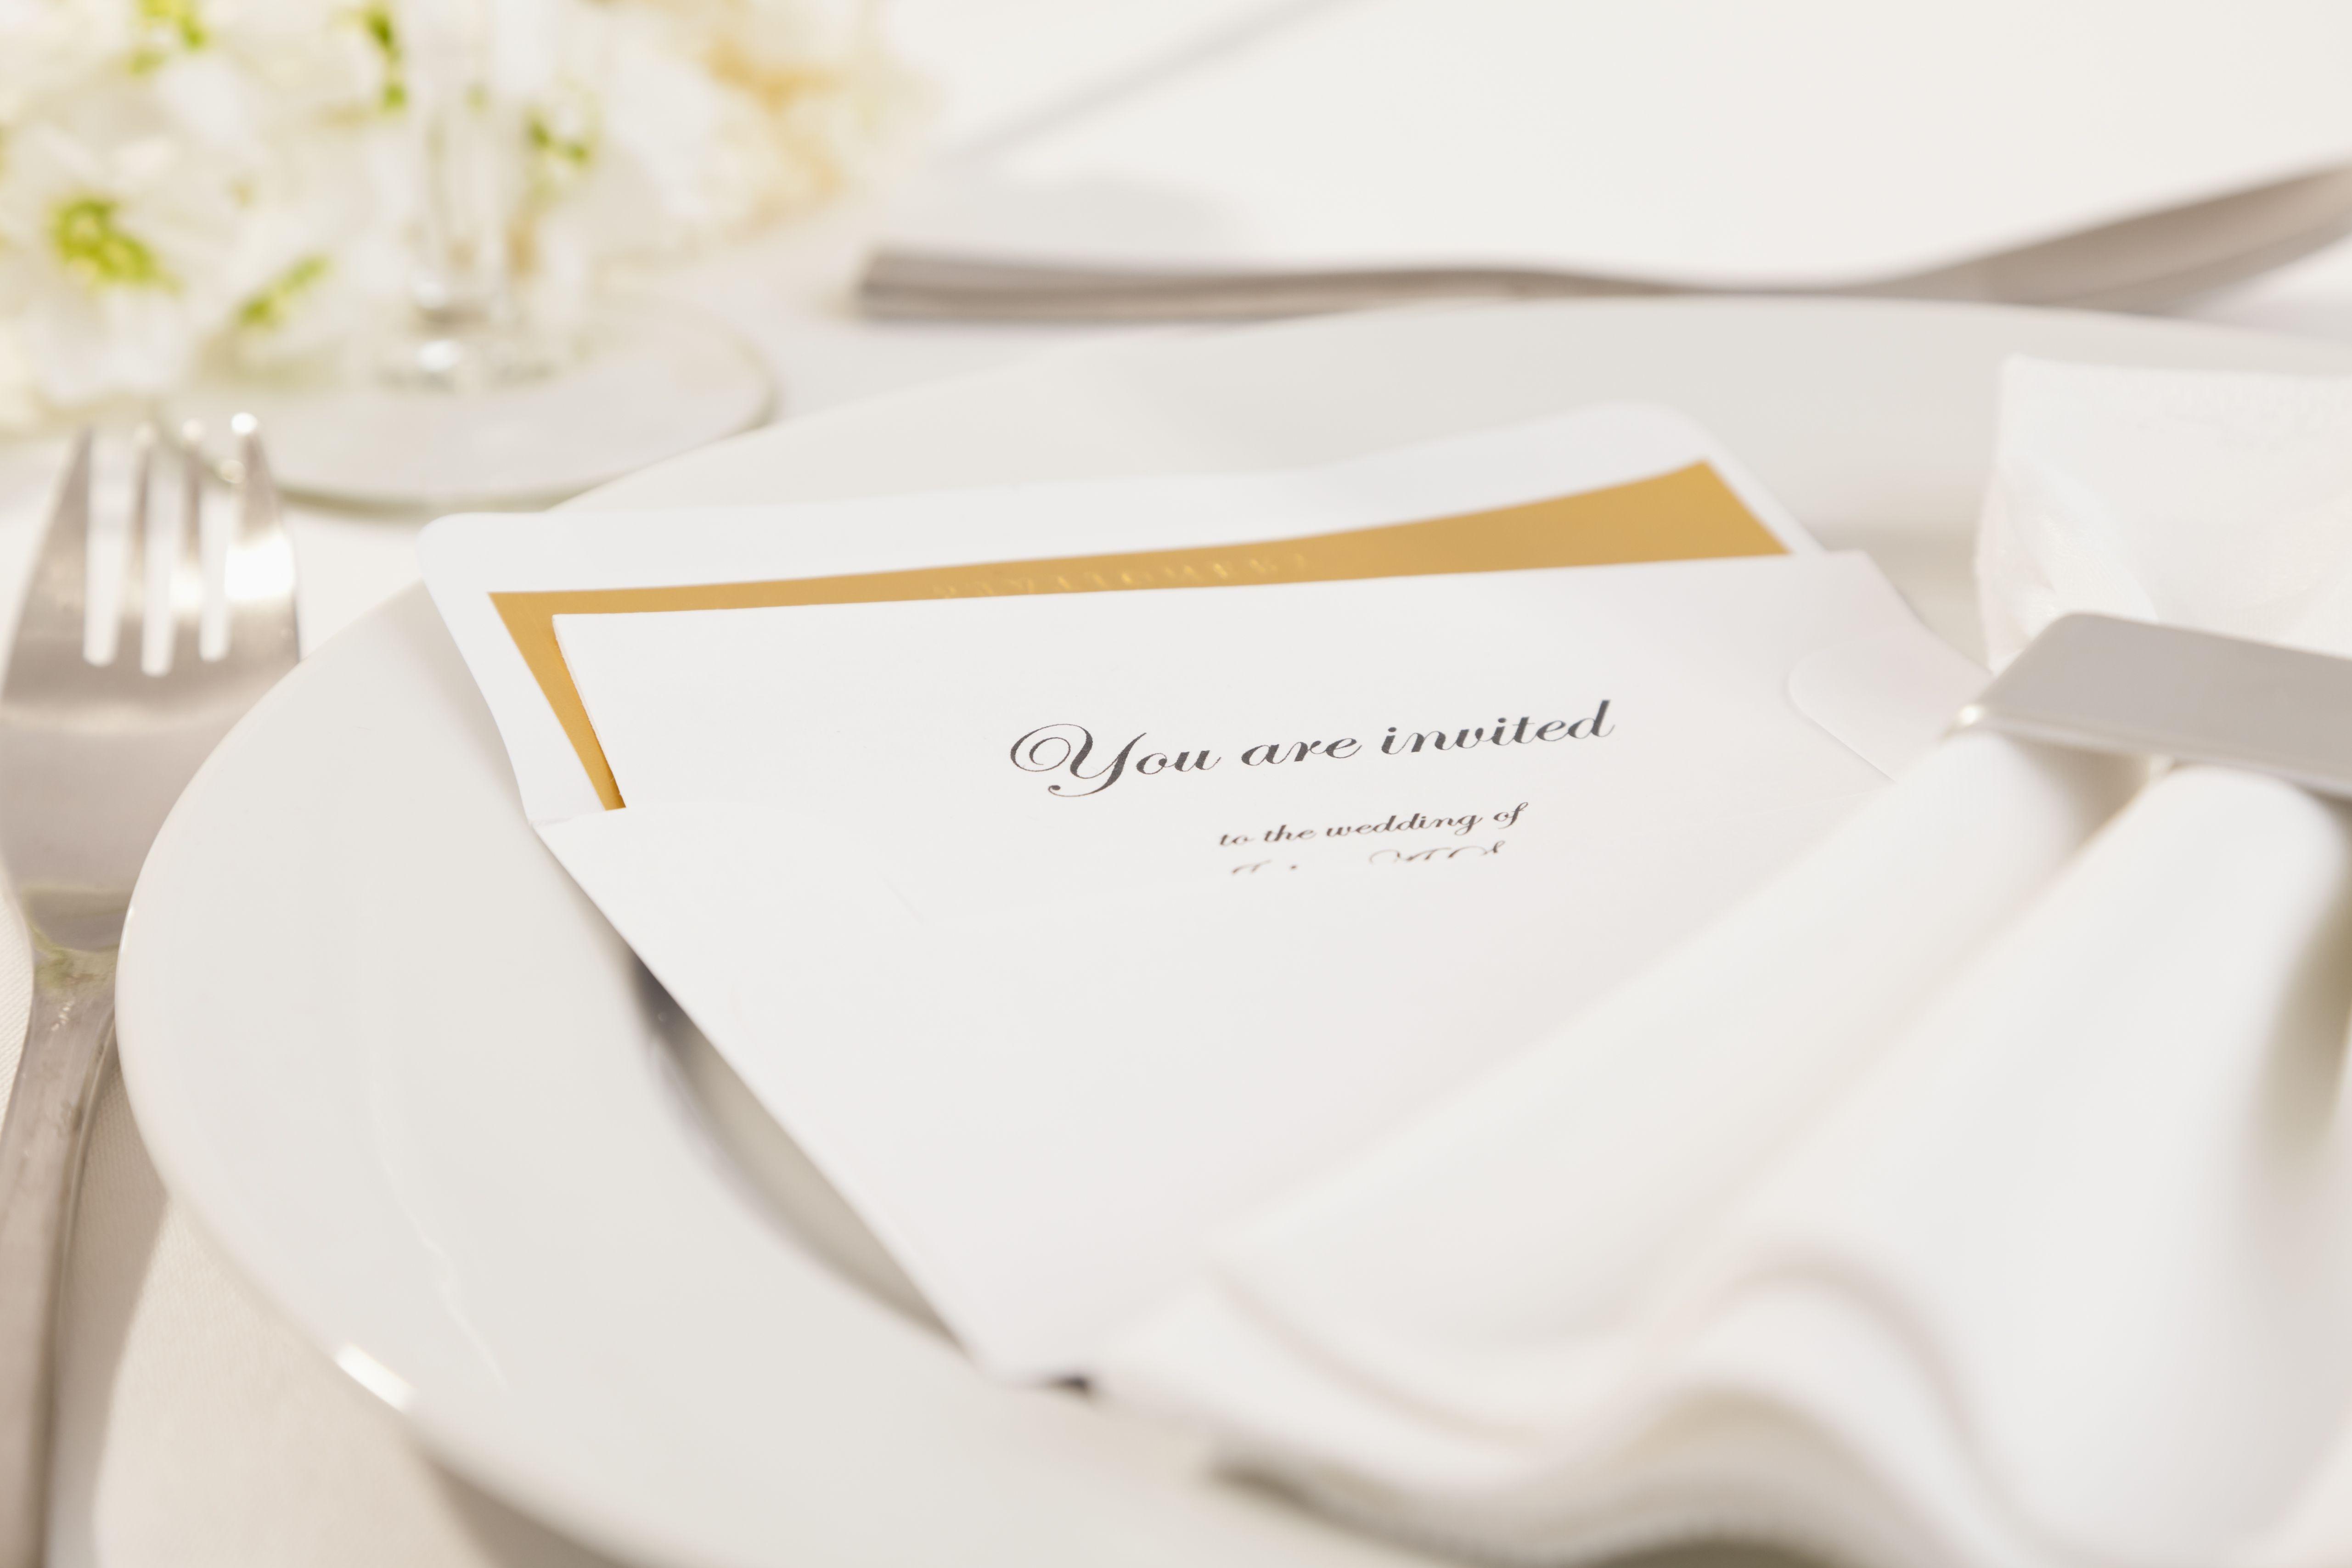 Free Wedding Invitations Templates Printable: 550+ Free Wedding Invitation Templates You Can Customize